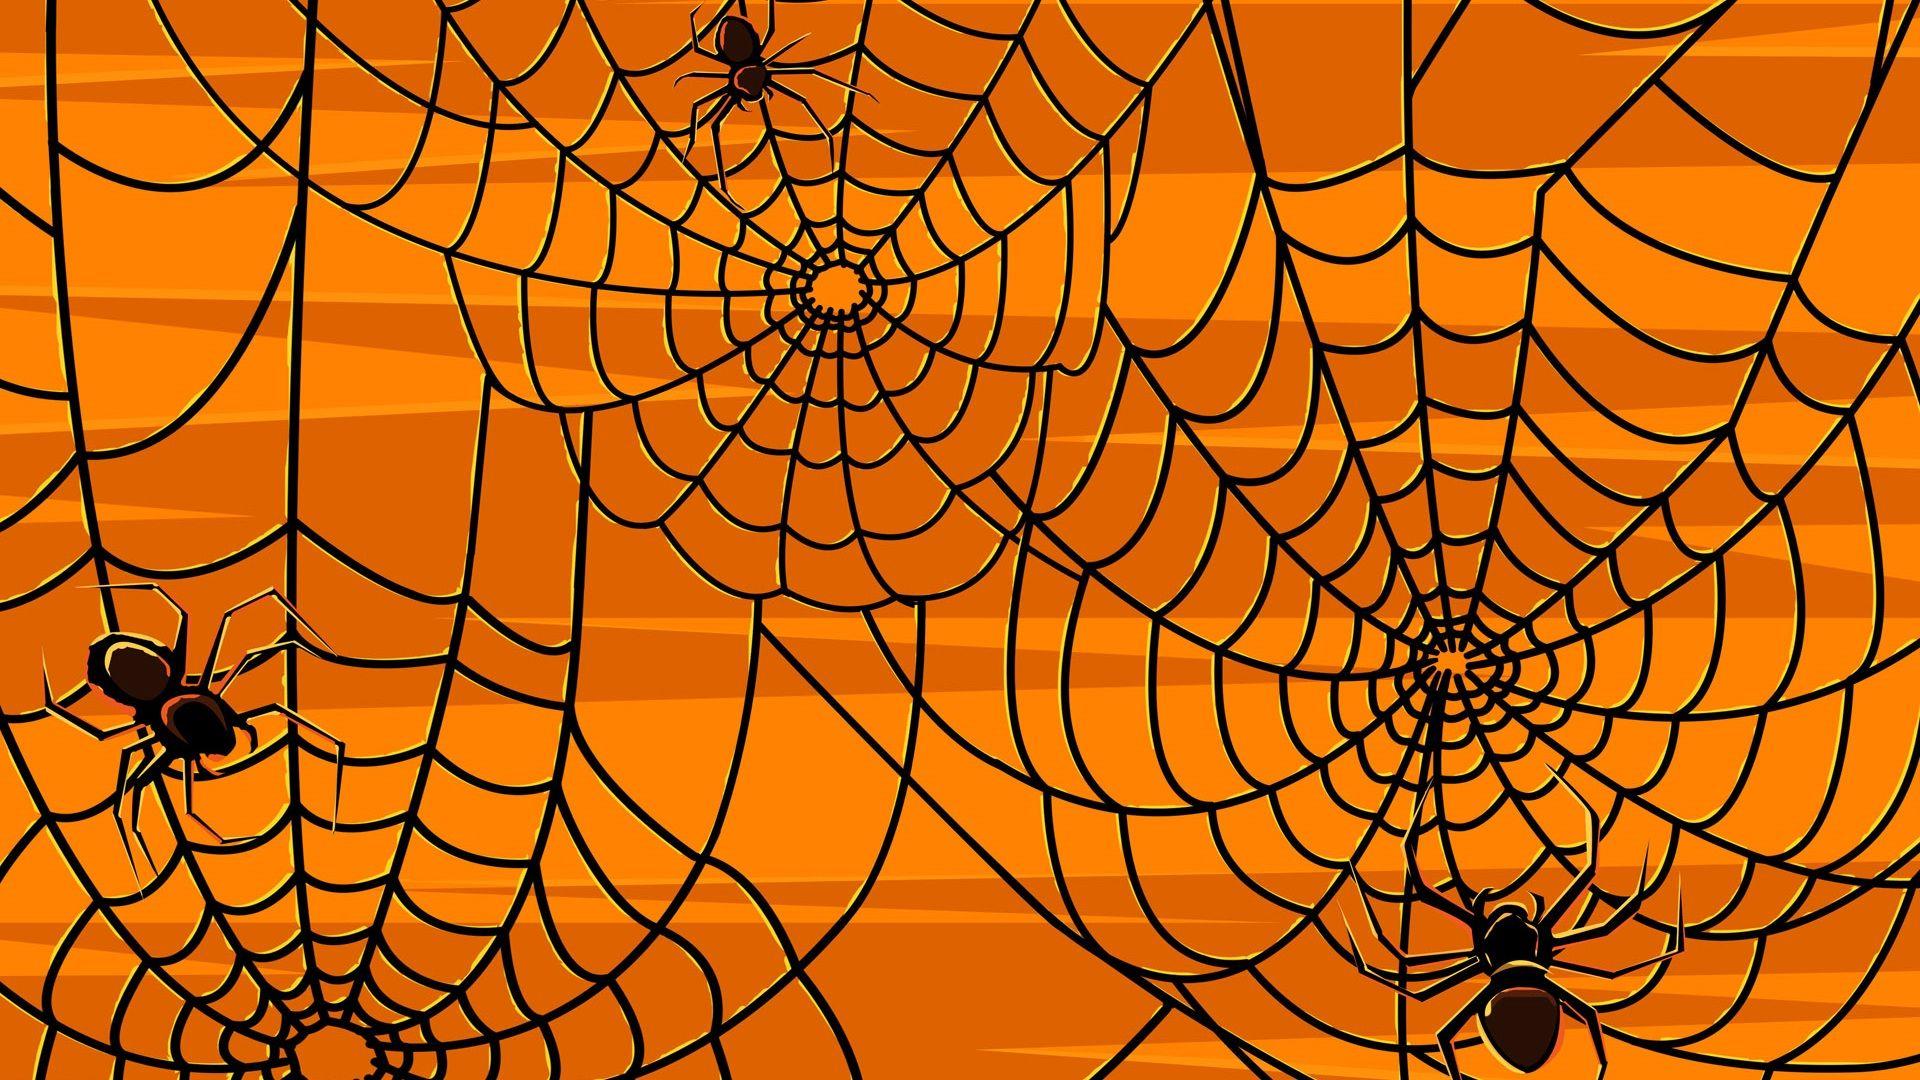 Download Wallpaper Halloween Pinterest - 200e8a2fa93242fabfbba564ae87810b  Gallery_585819.jpg